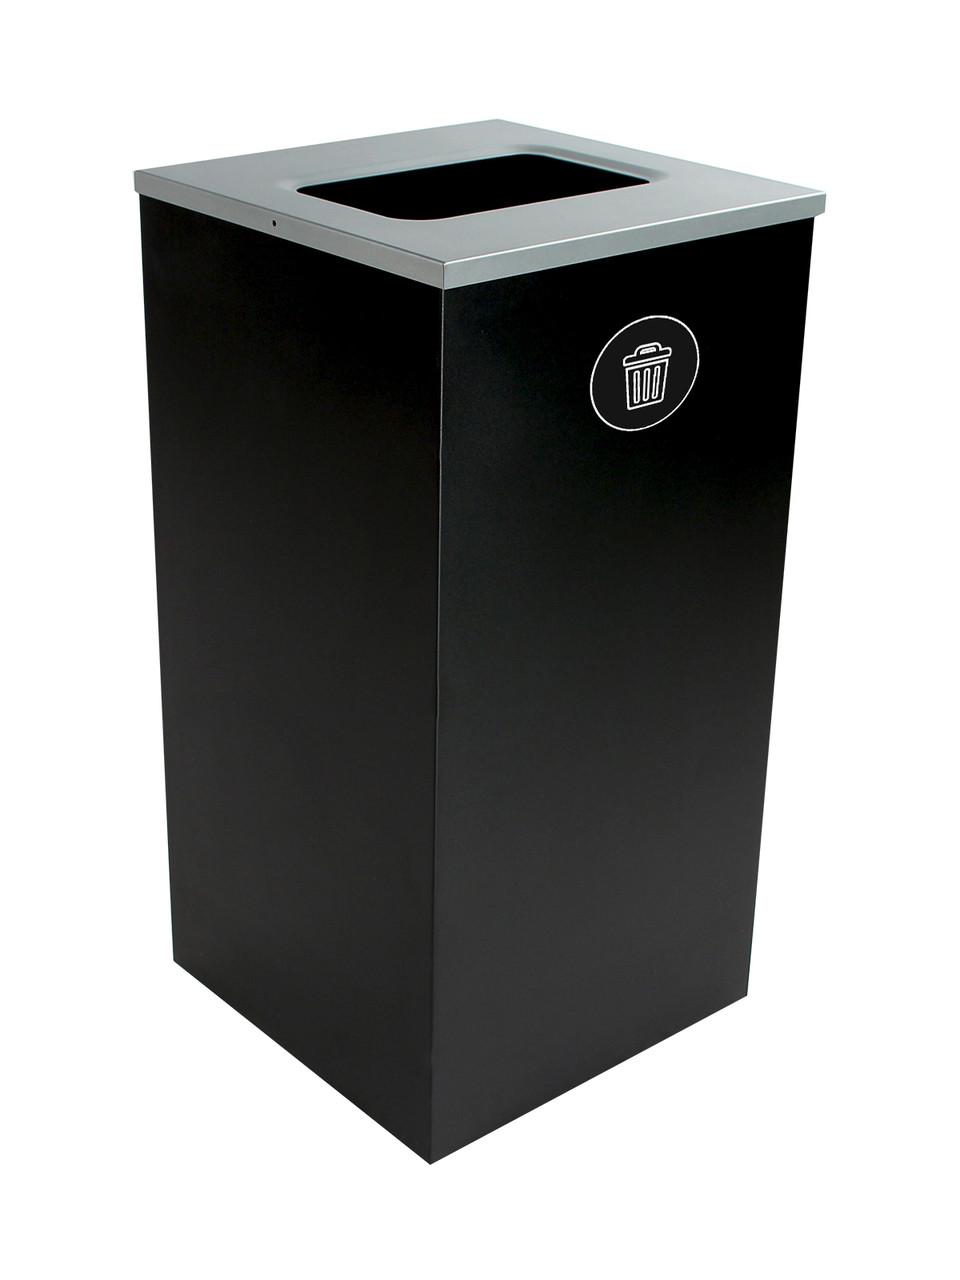 24 Gallon Steel Spectrum Cube Square Waste Can Black 8107048-4